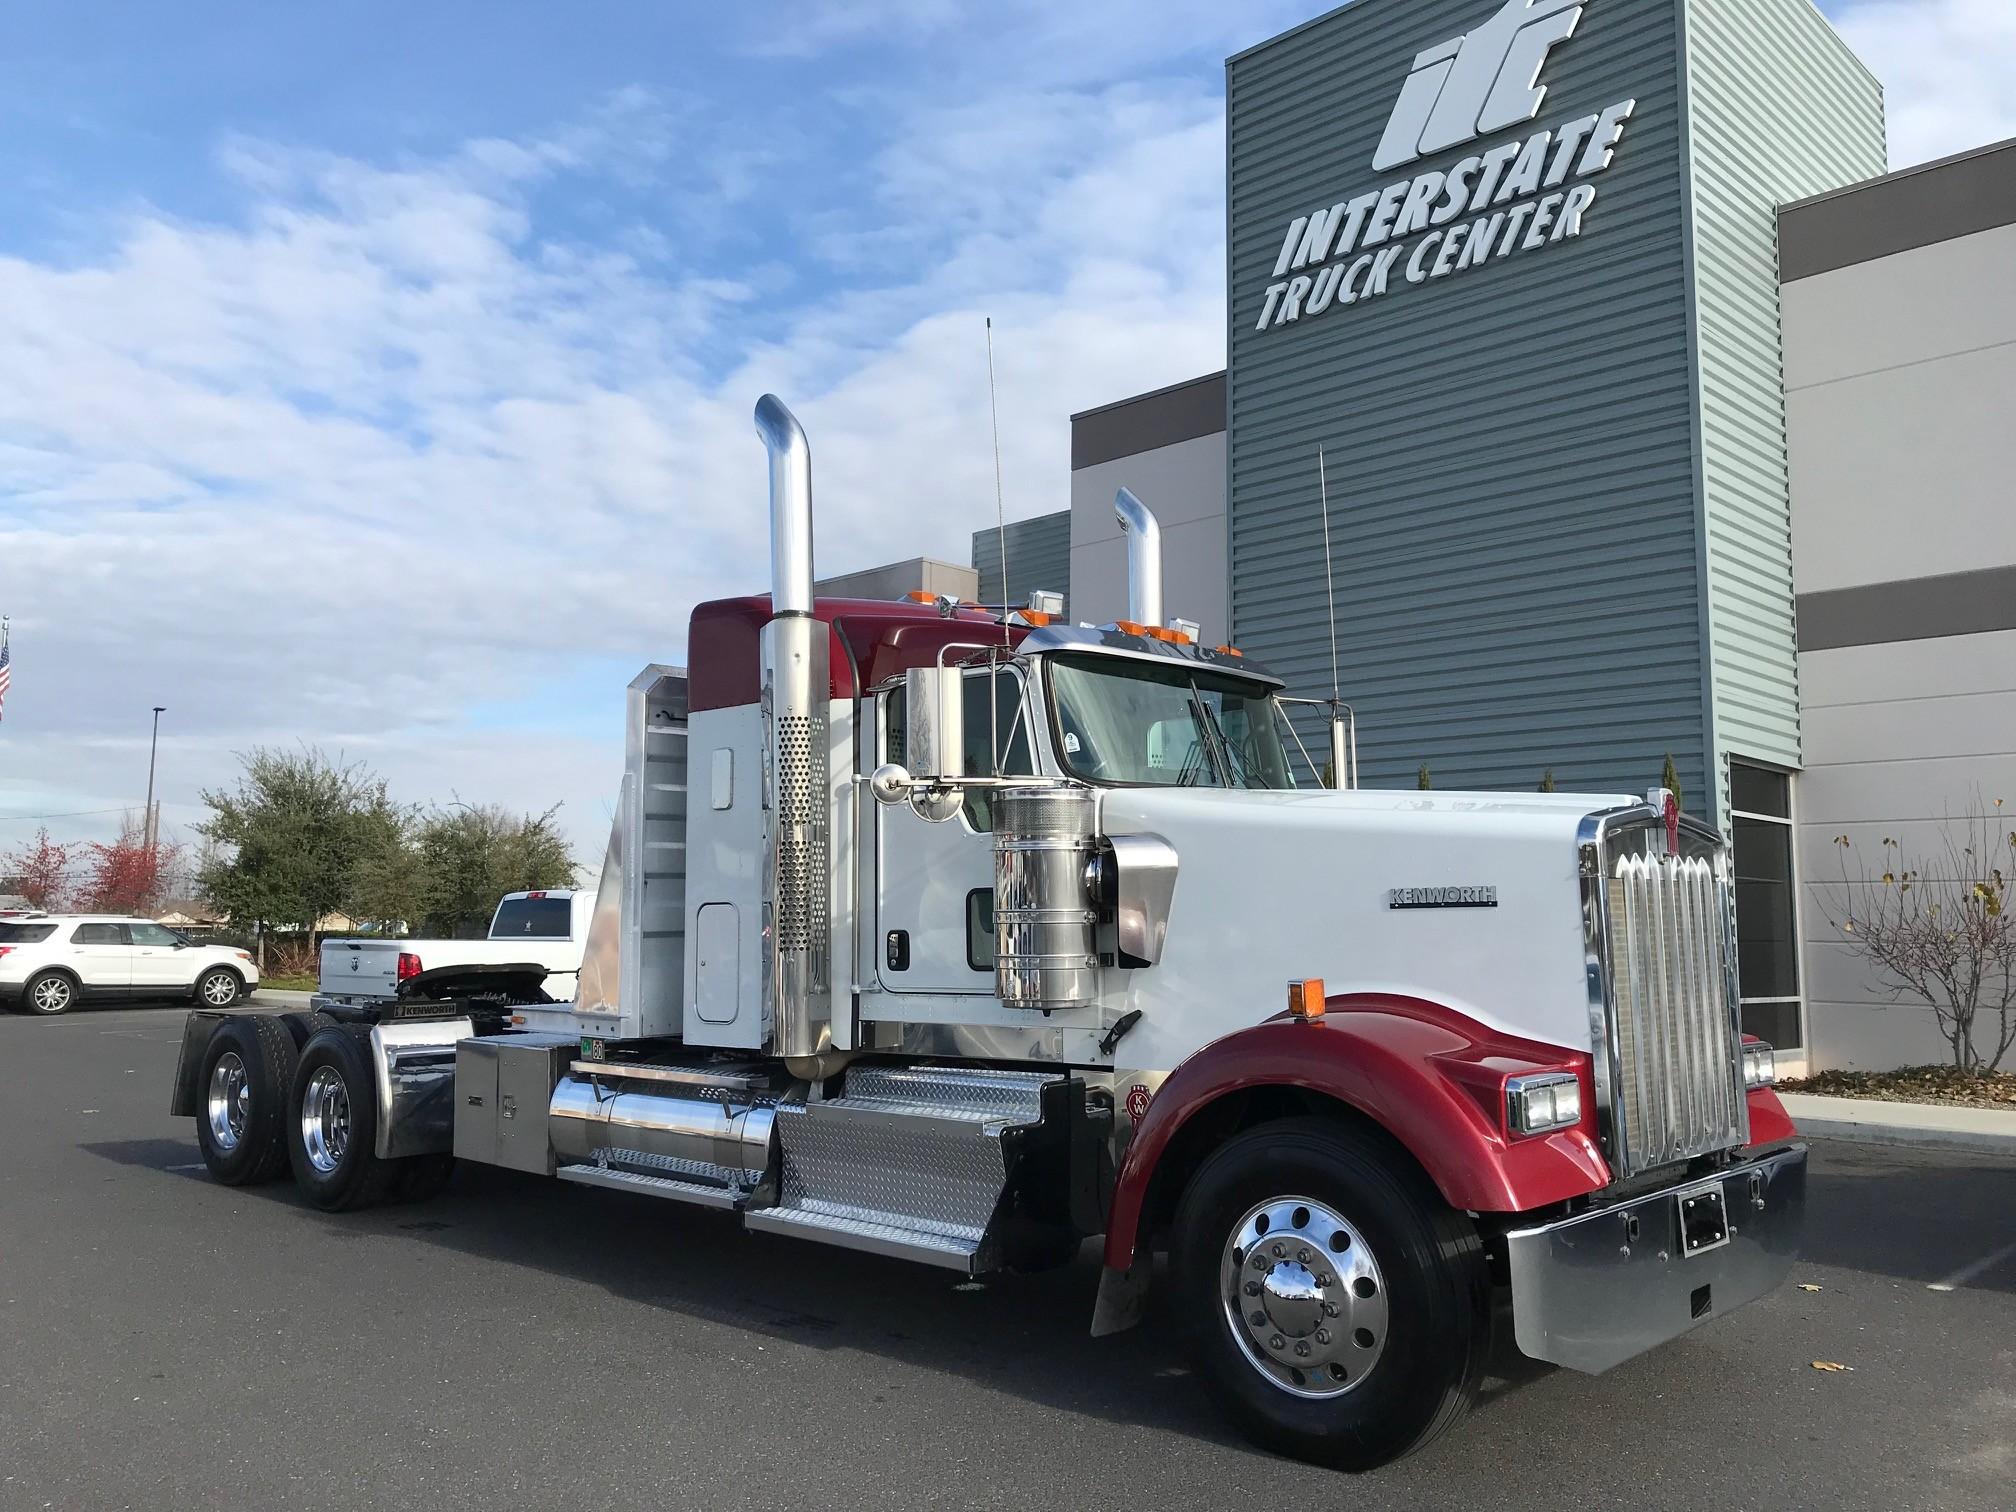 Used, 2014, Kenworth, W900, Conventional Trucks